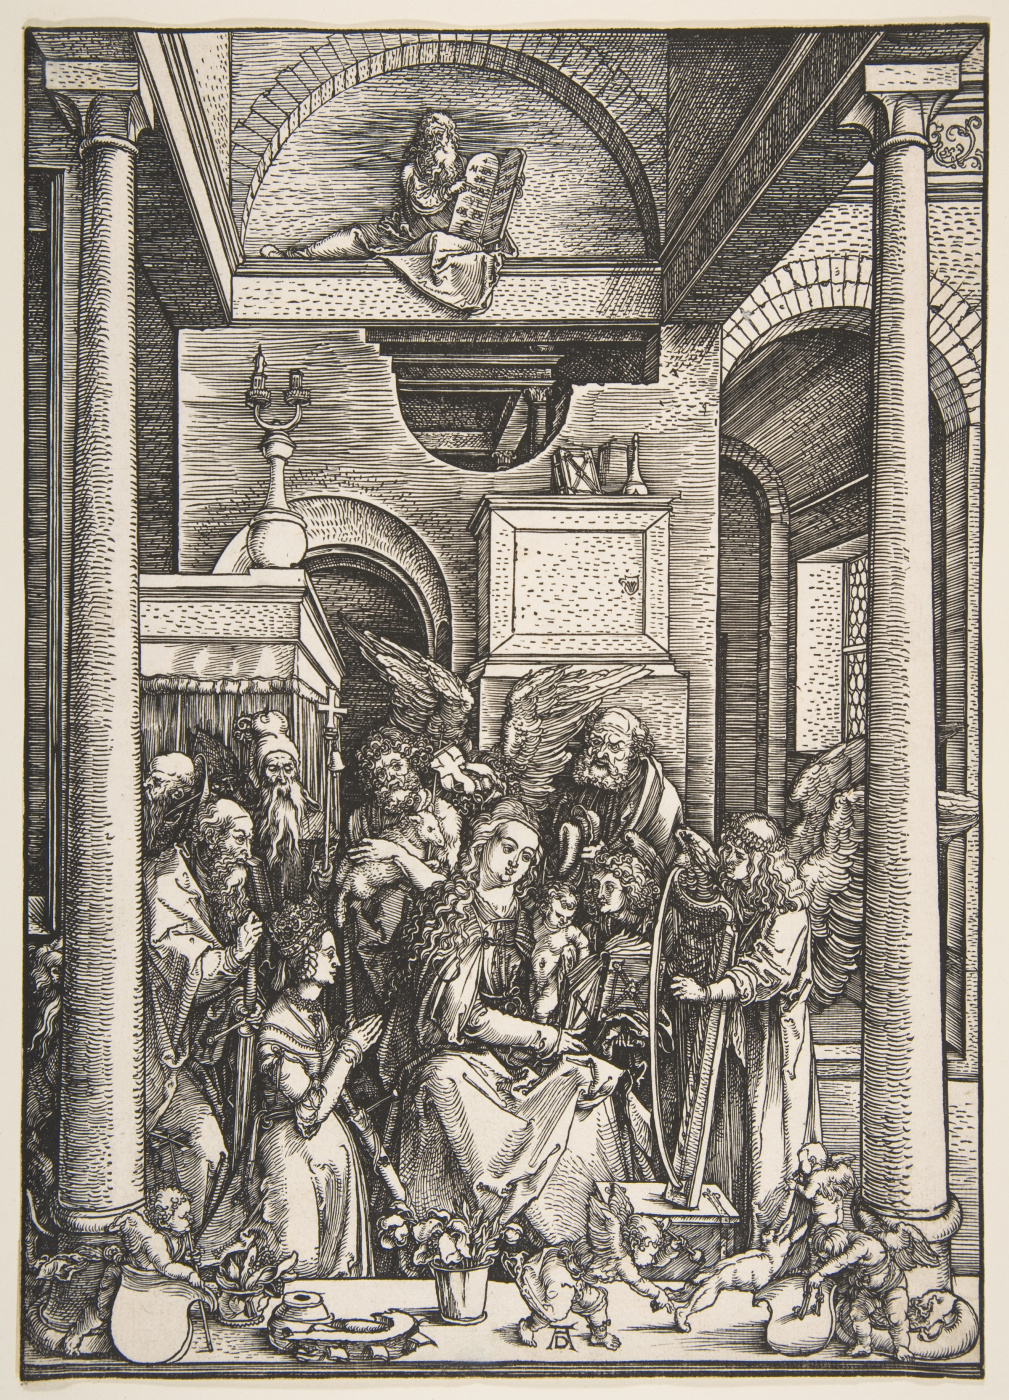 Albrecht Durer. The Glorification Of The Virgin Mary